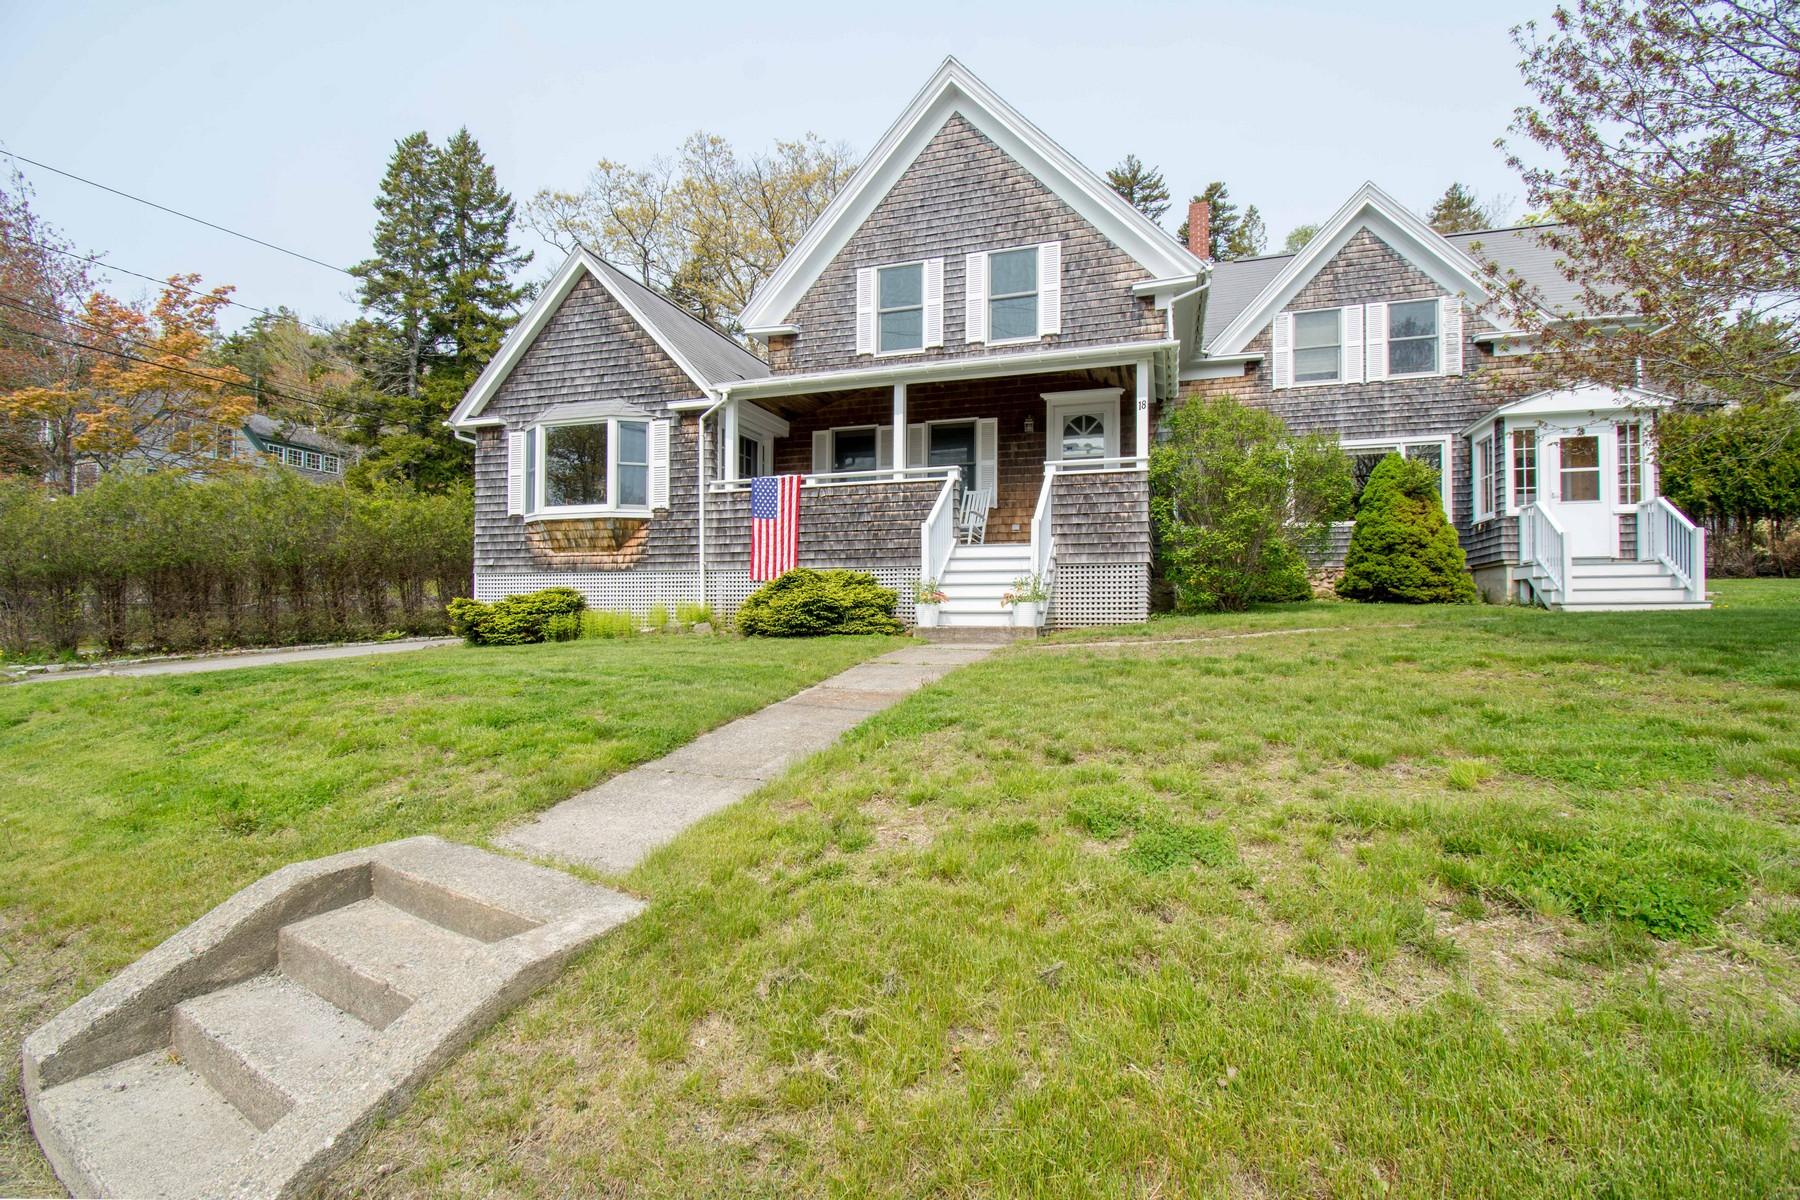 Single Family Homes for Active at Harborside Cottage 18 Harborside Road Northeast Harbor, Maine 04662 United States